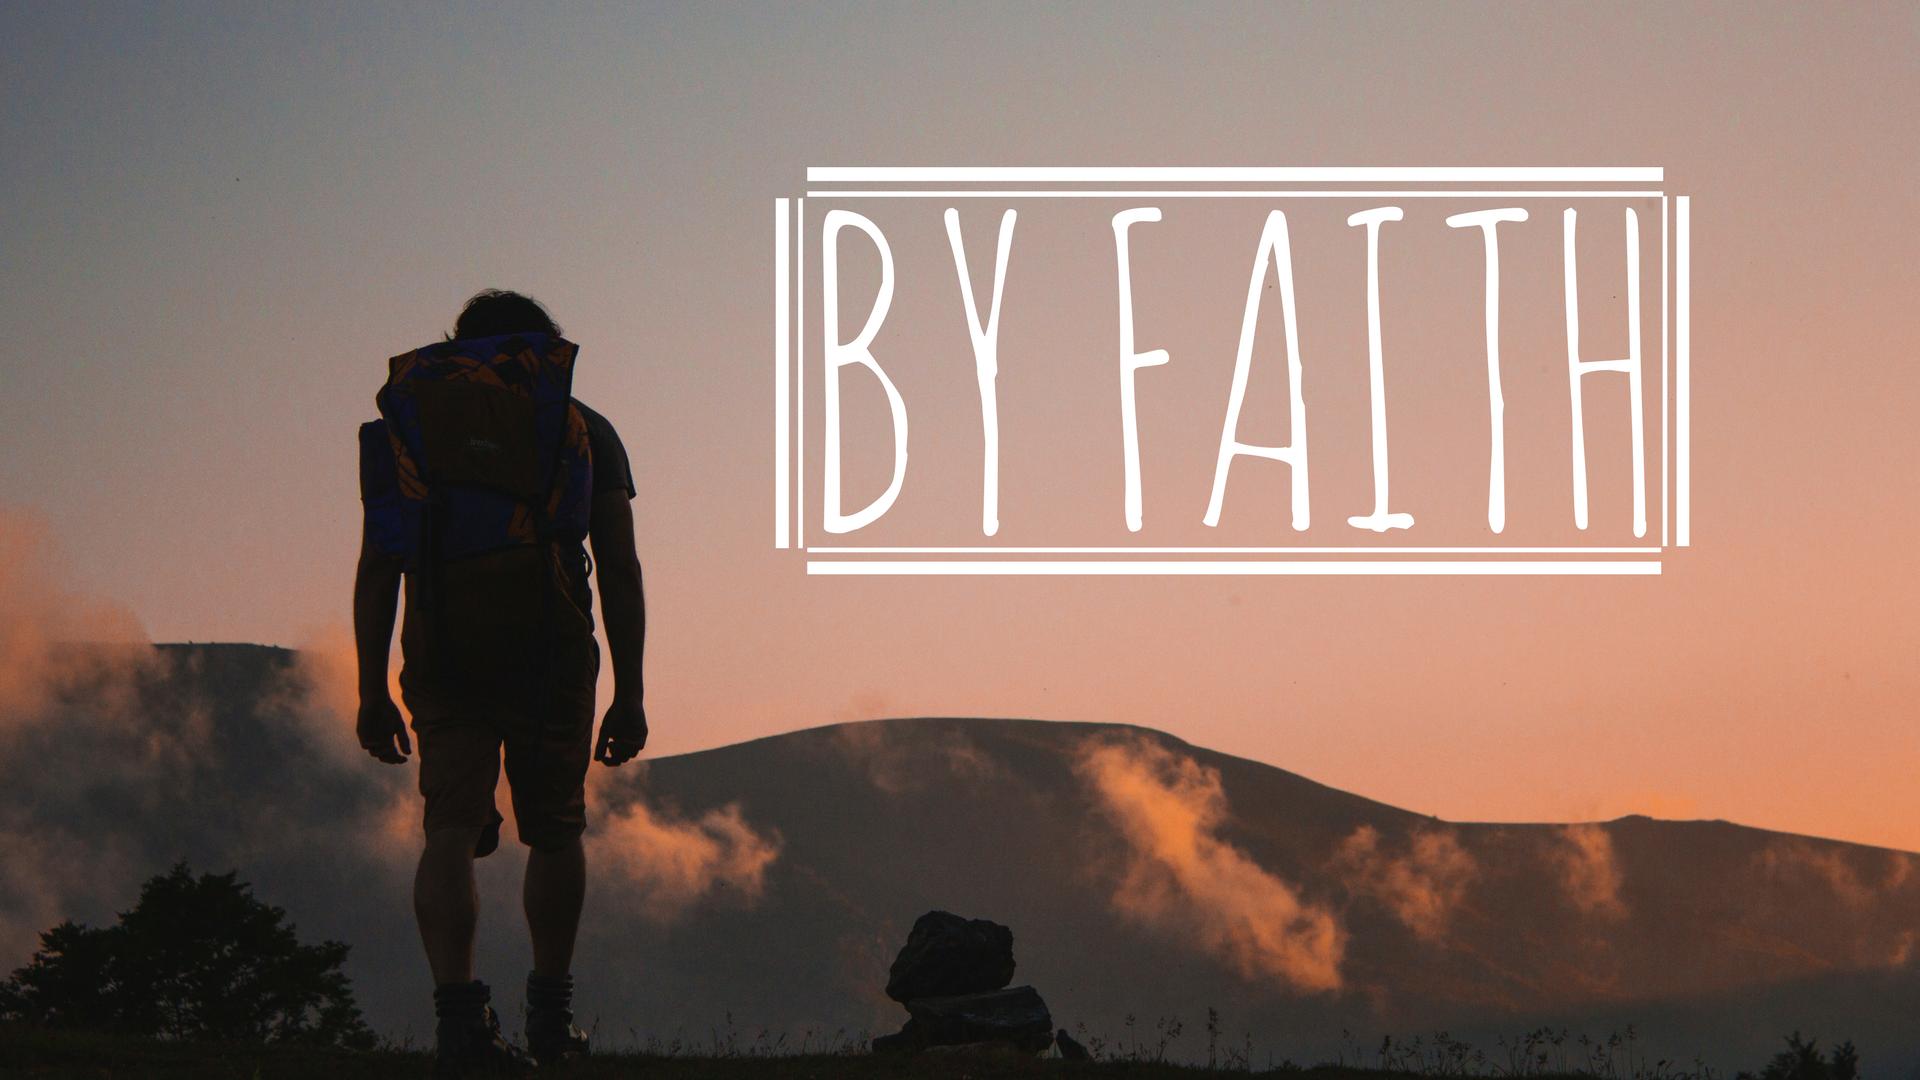 Listen to Sunday's sermon over Hebrews 11:15-17.